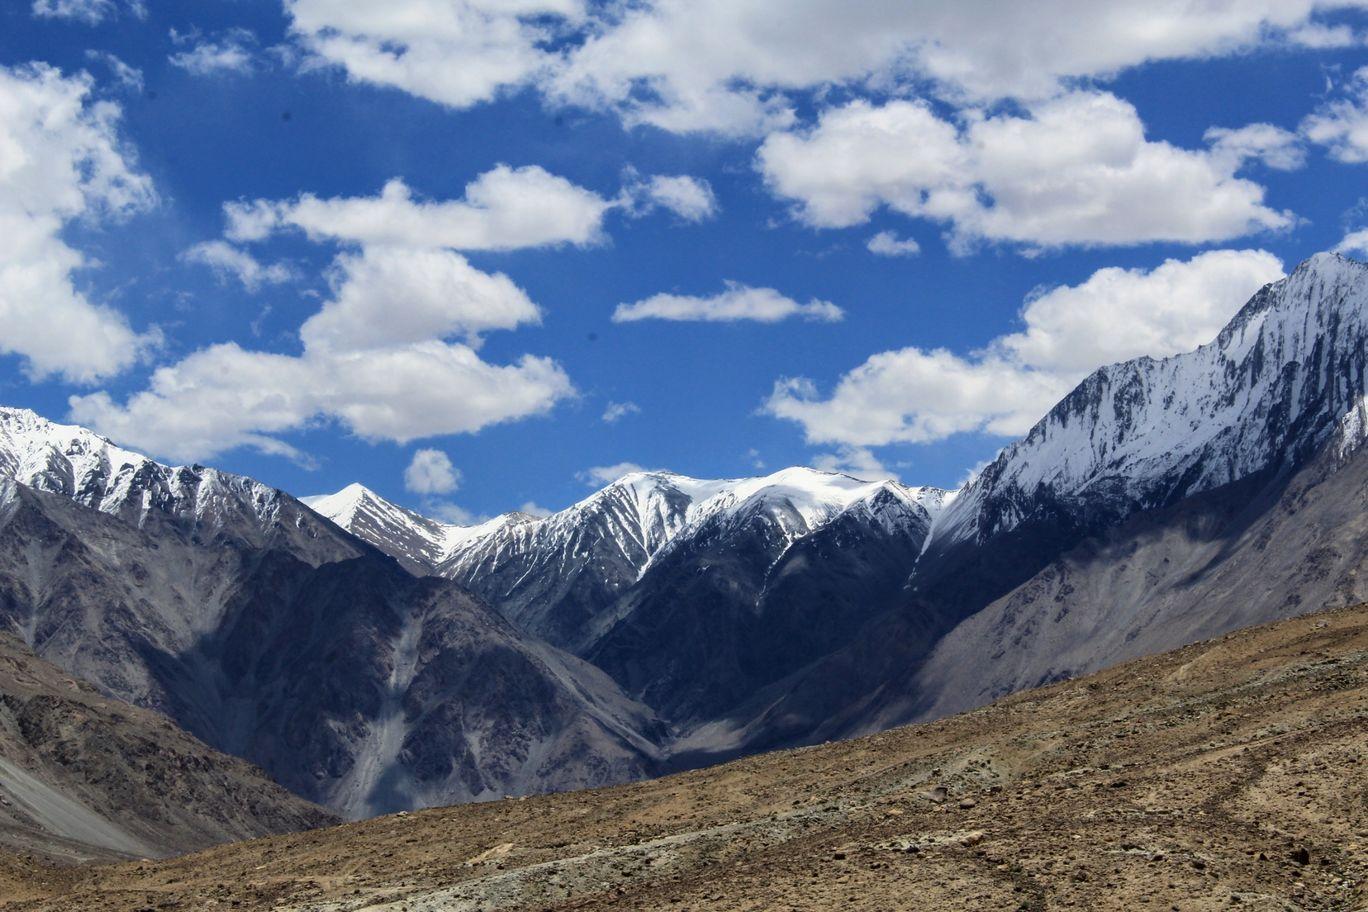 Photo of Himalayas By Rashmi